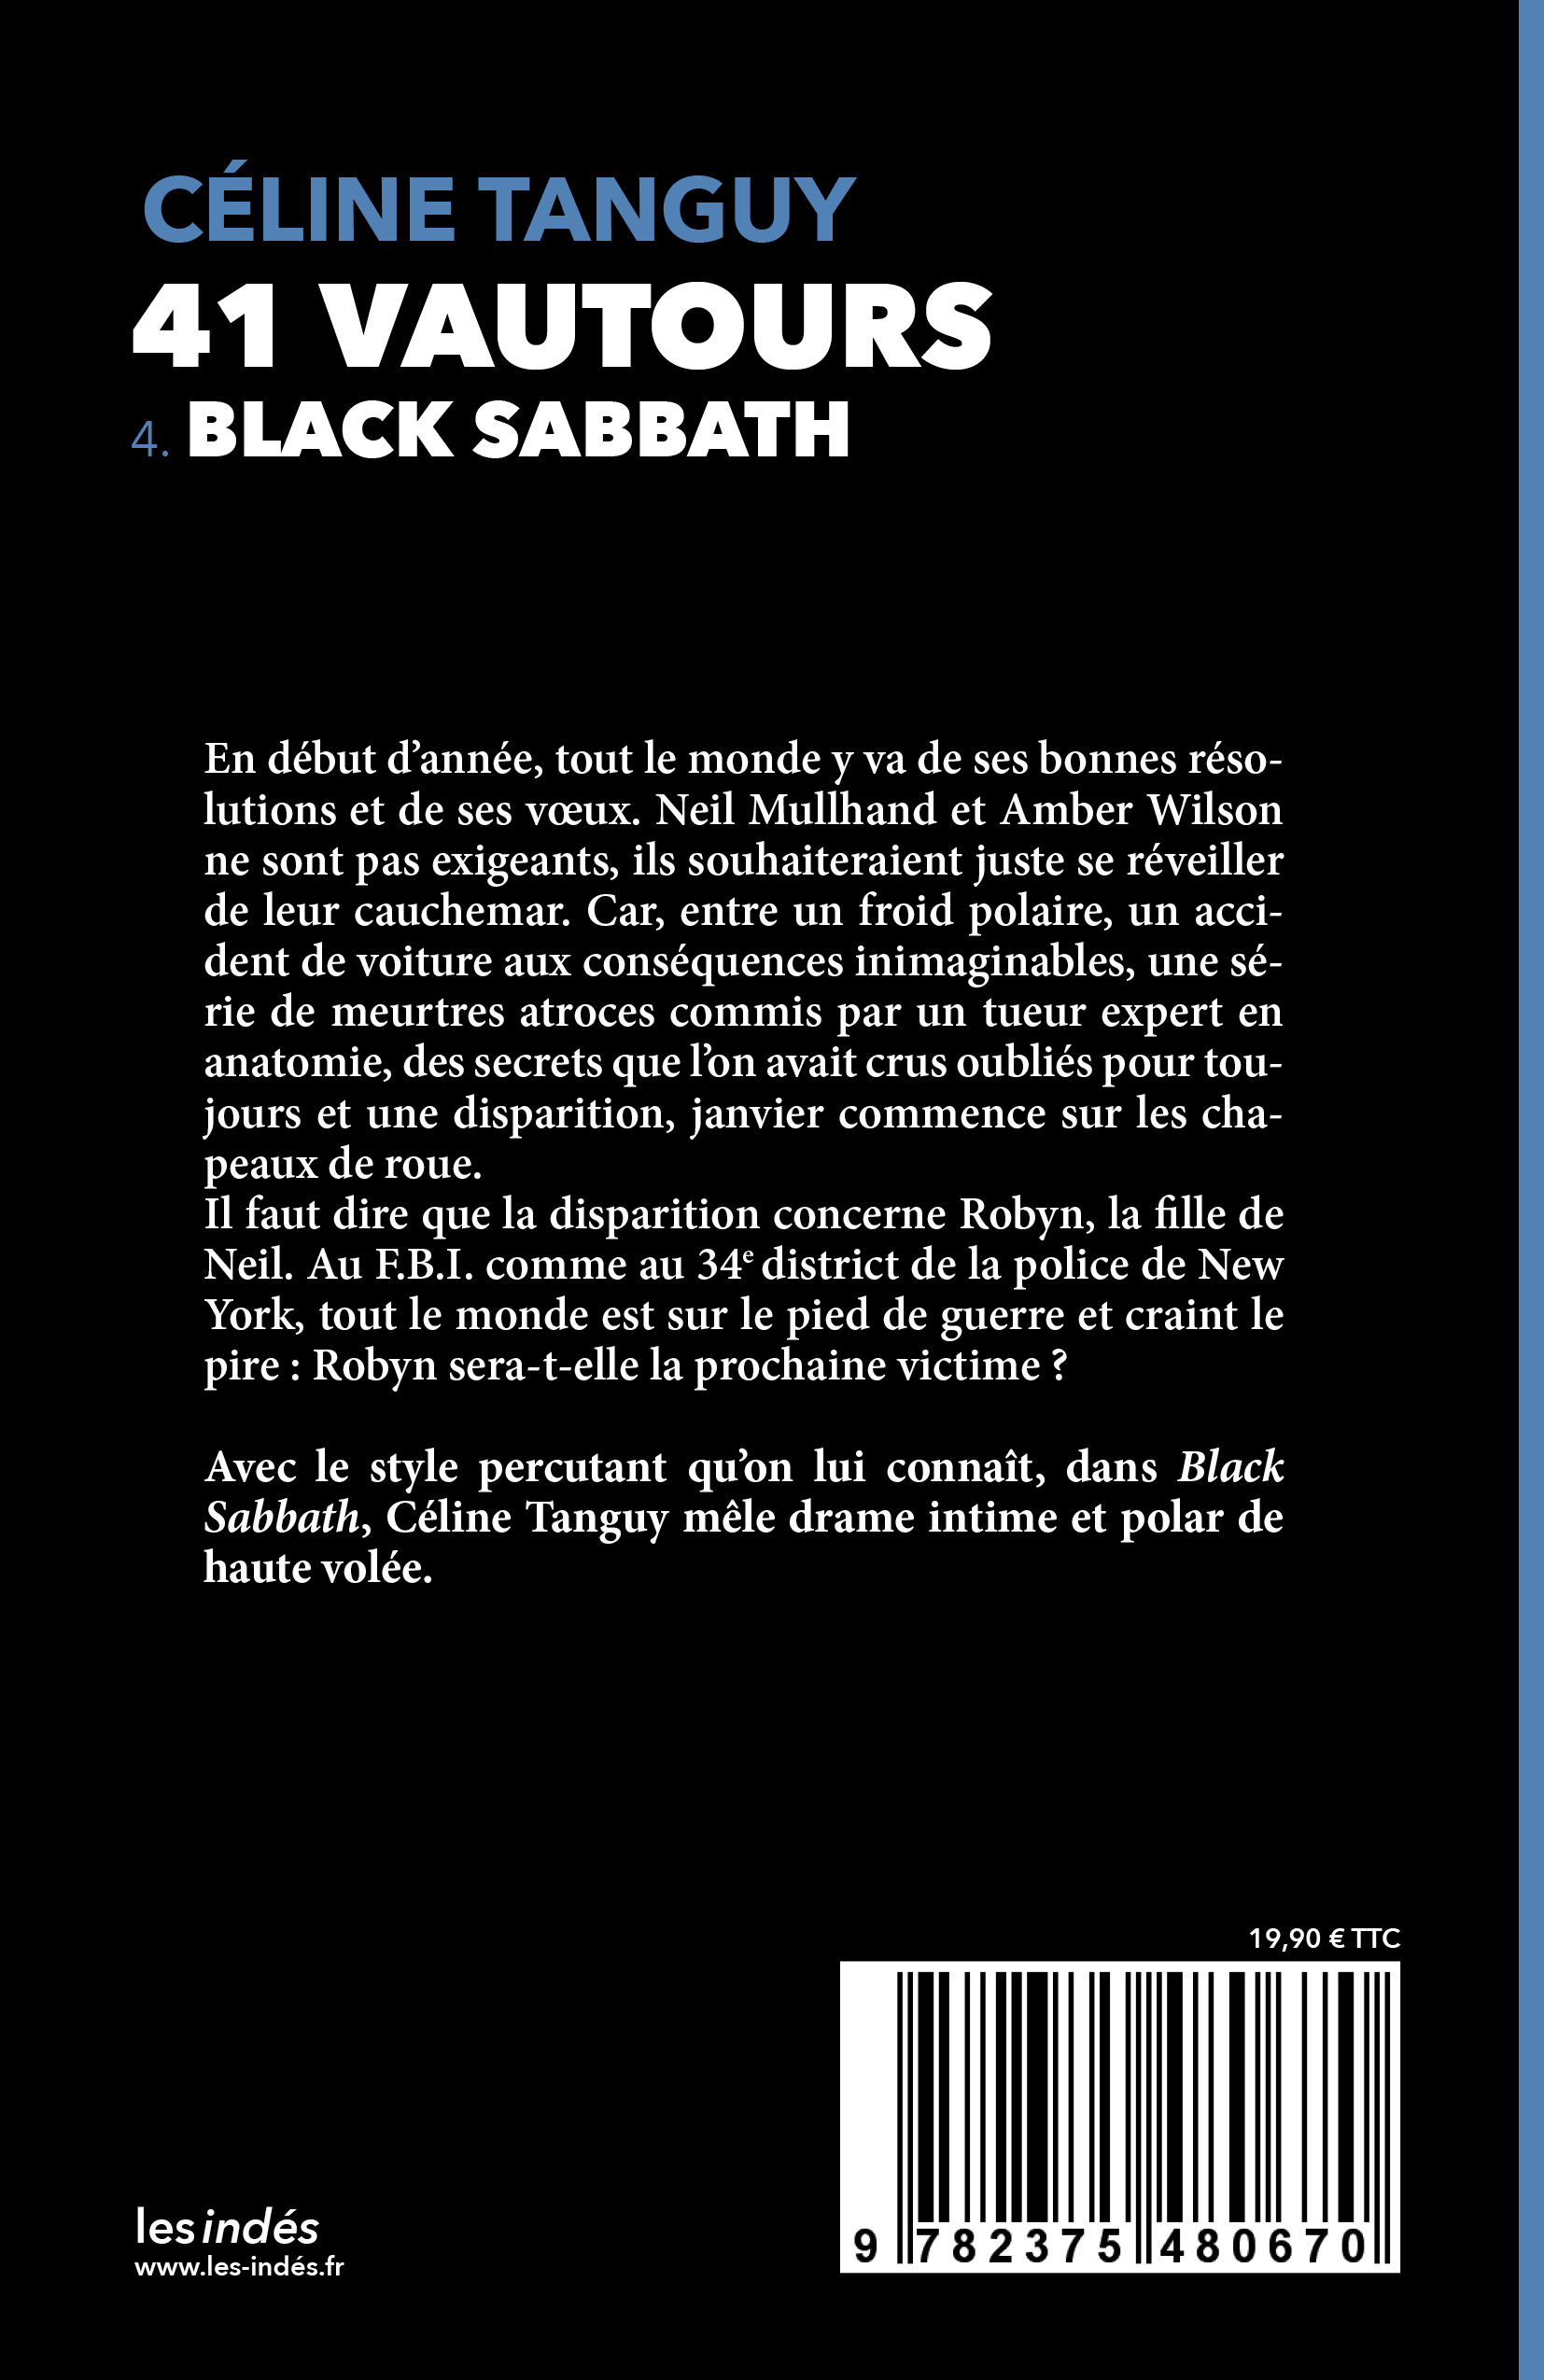 CV4_Black_Sabbath